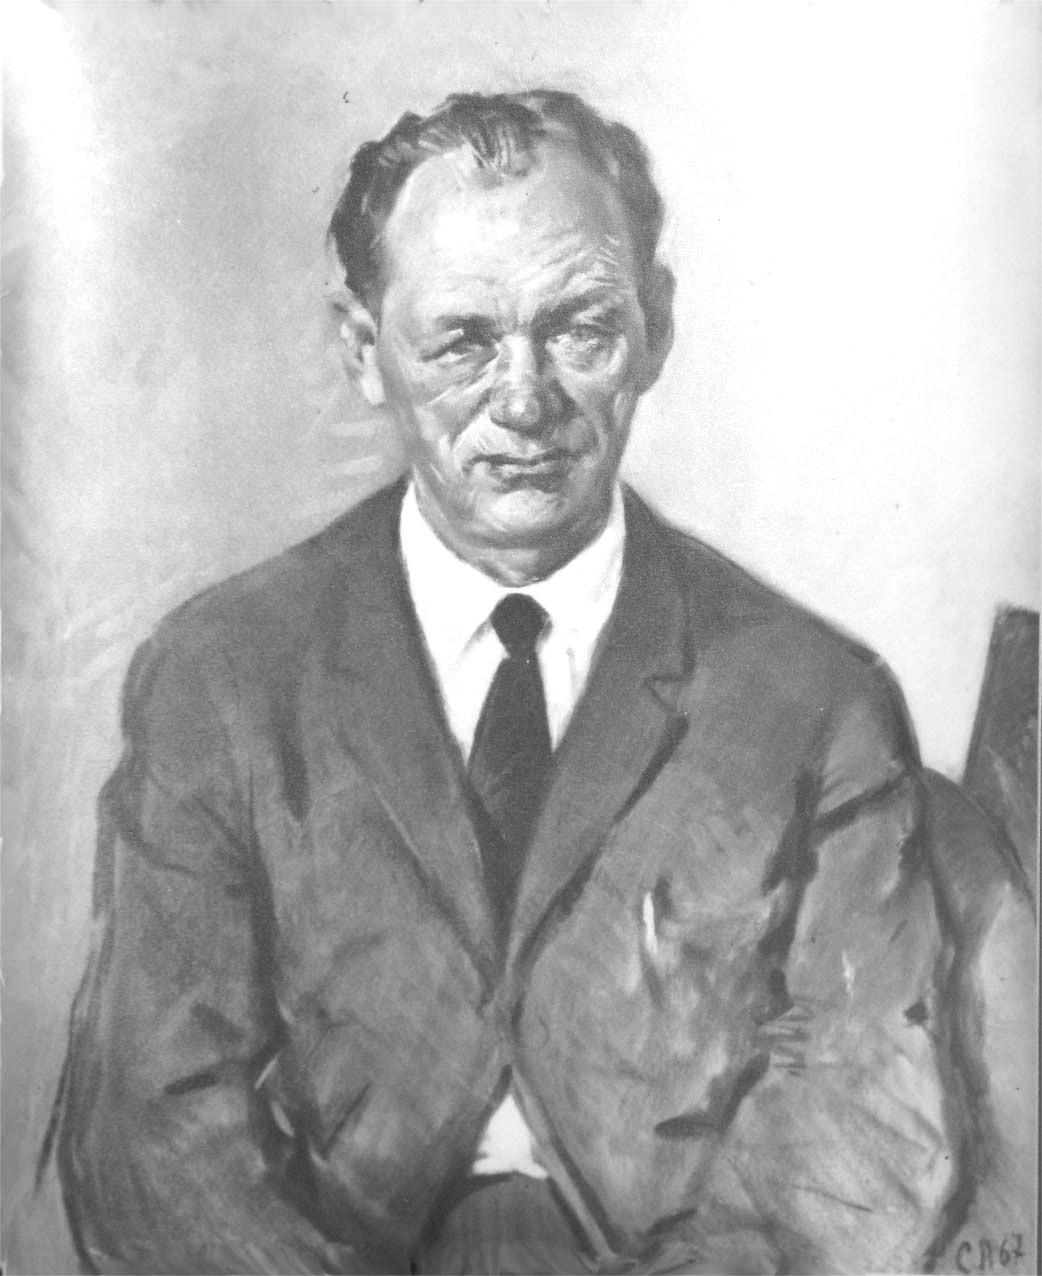 С.Петров. Портрет А.М.Тишкина. 1967г.